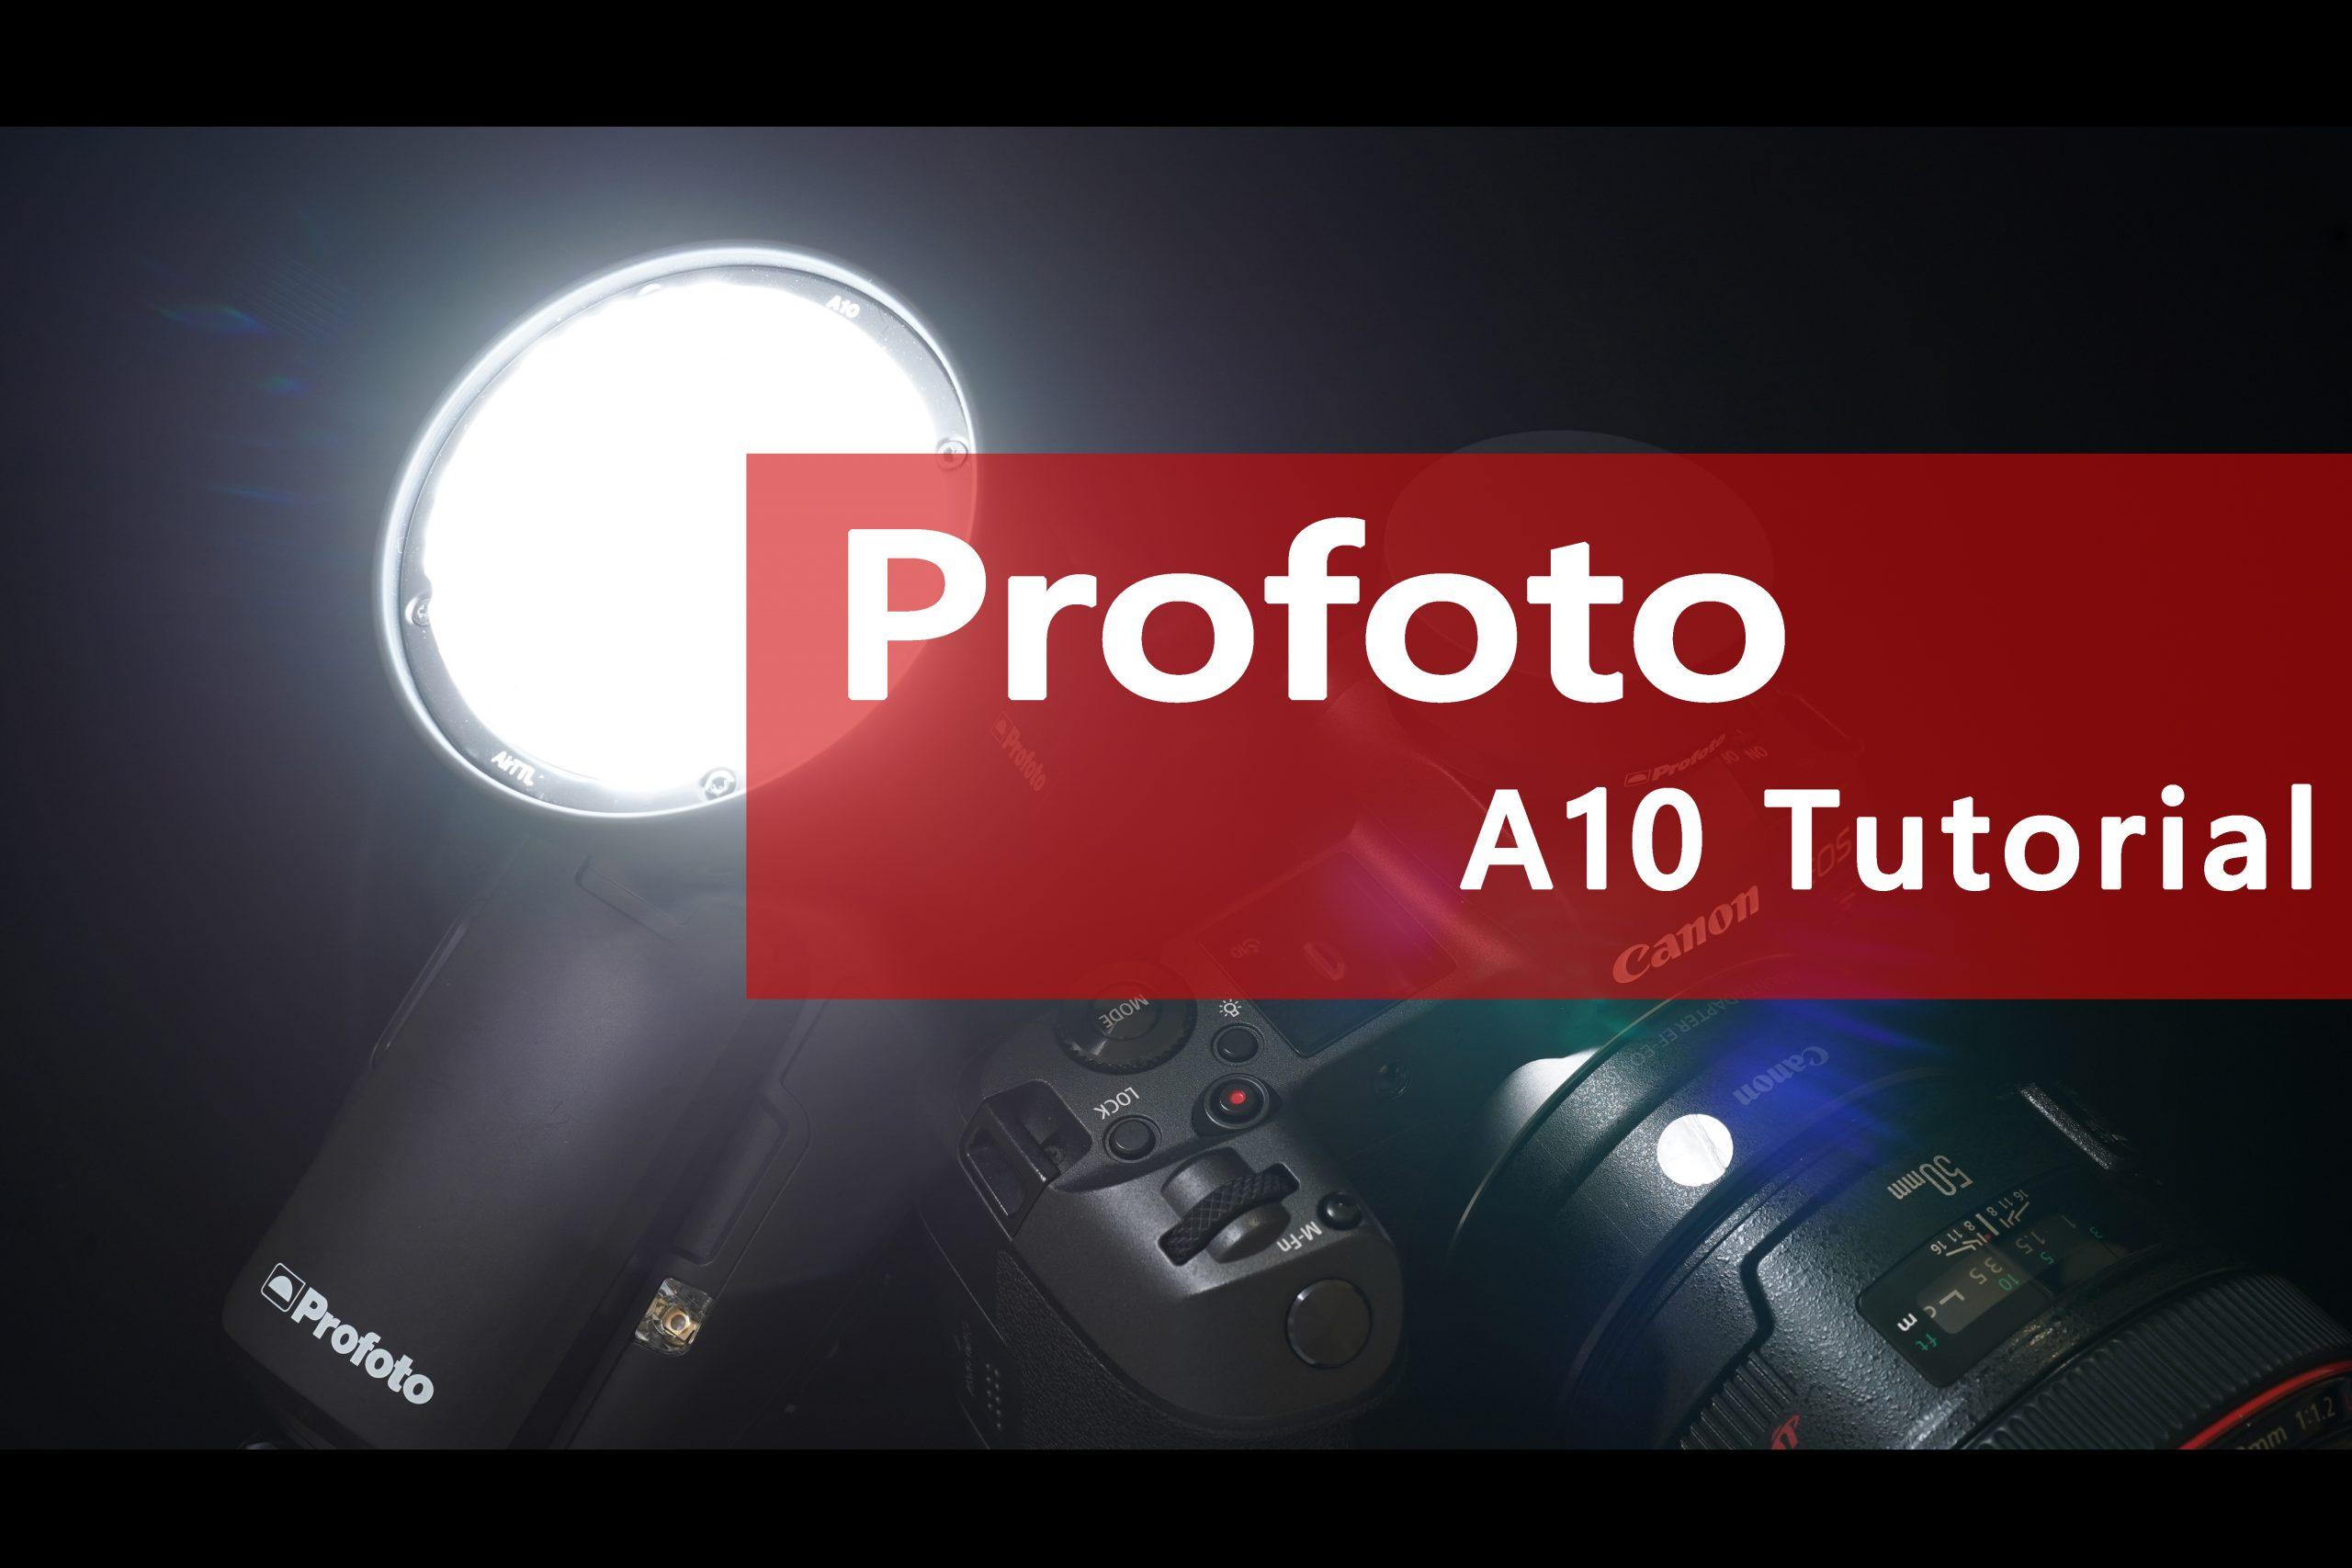 【Profoto】A10 Tutorial